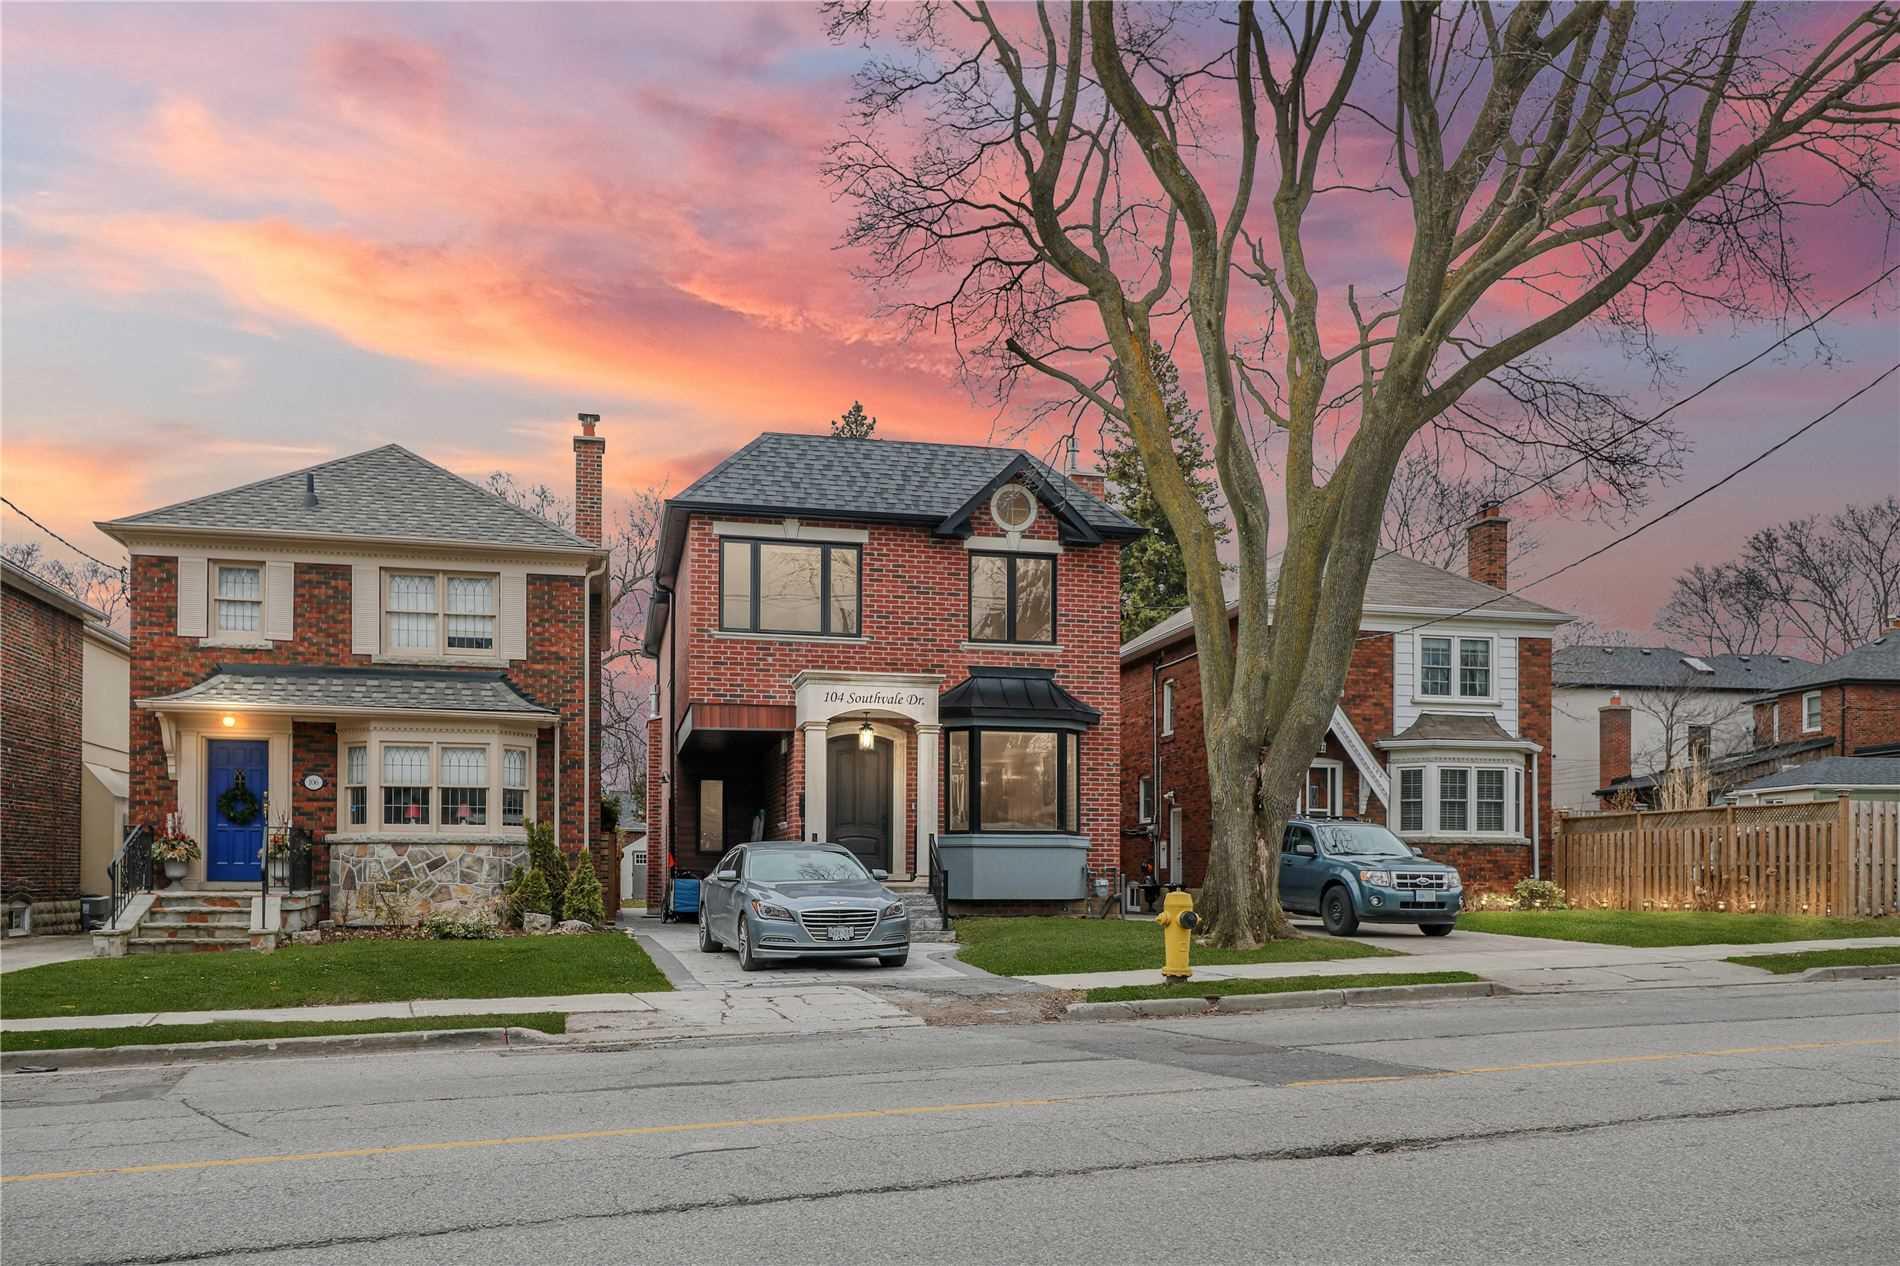 104 Southvale Dr, Toronto, M4G1G7